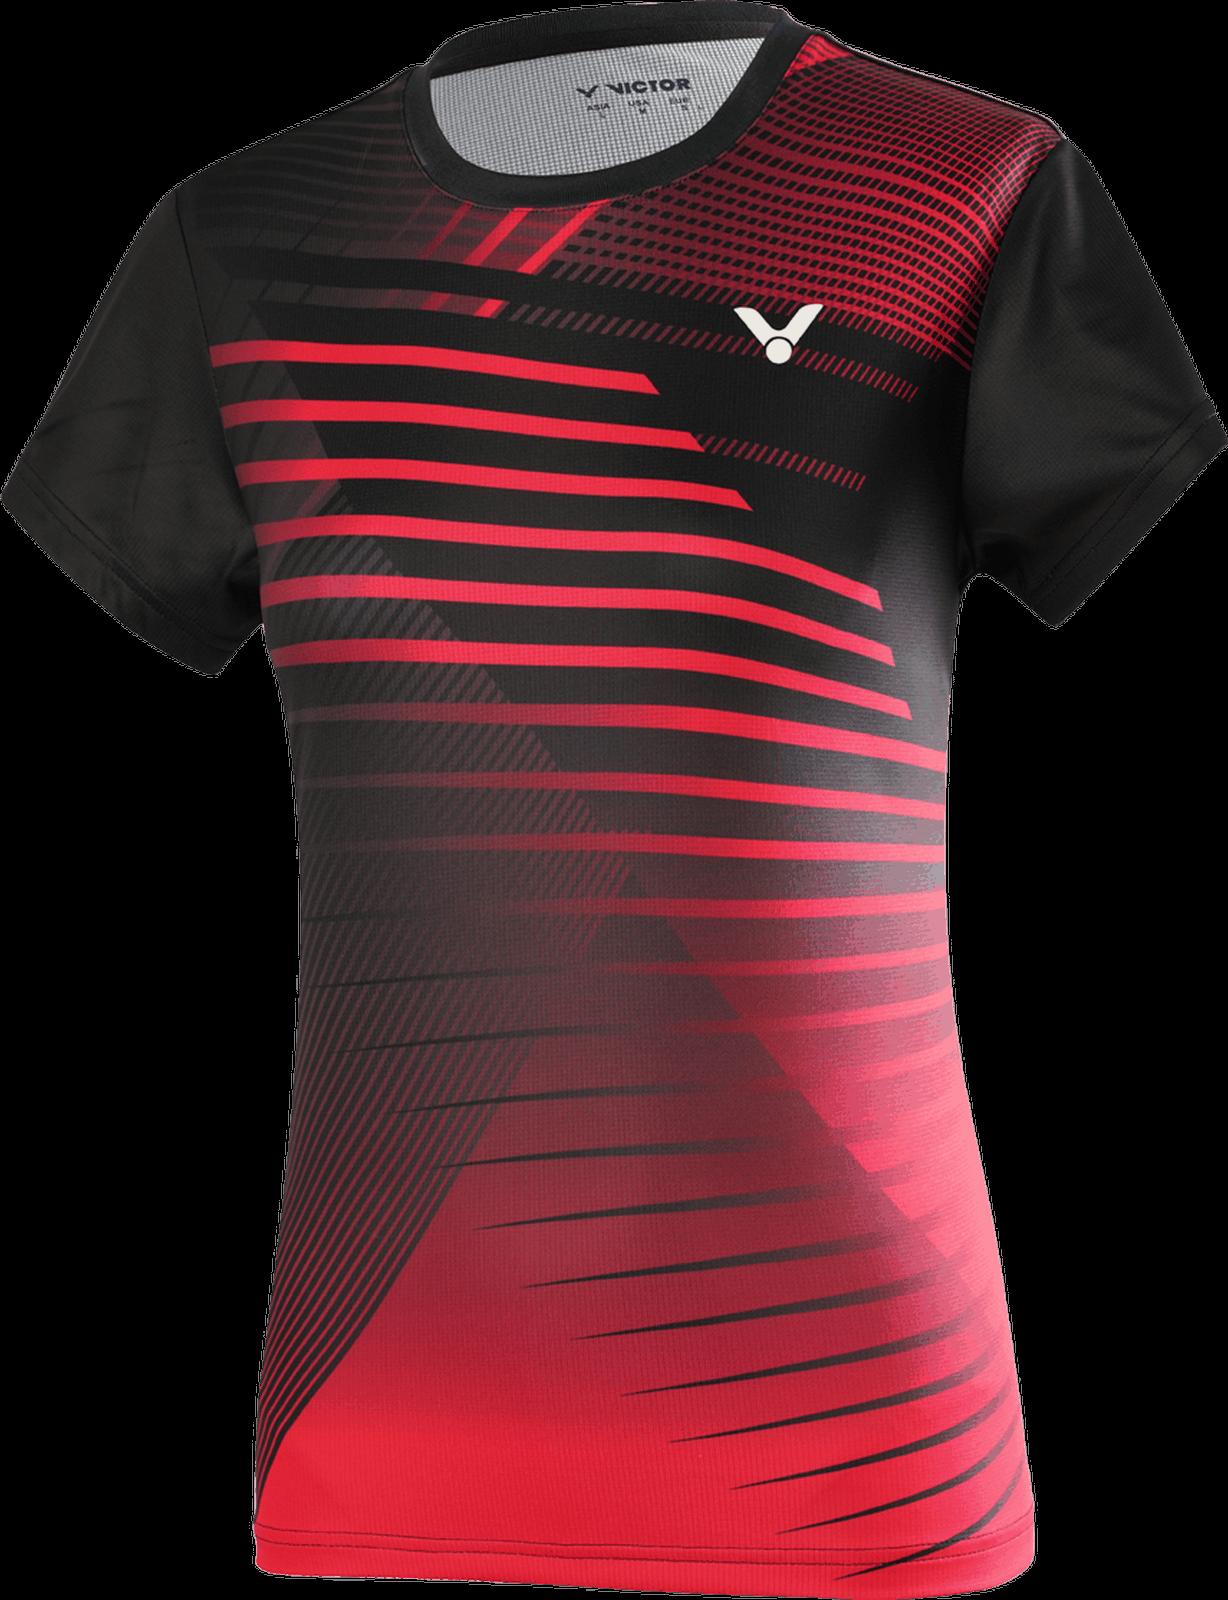 VICTOR T-Shirt T-01001TD C